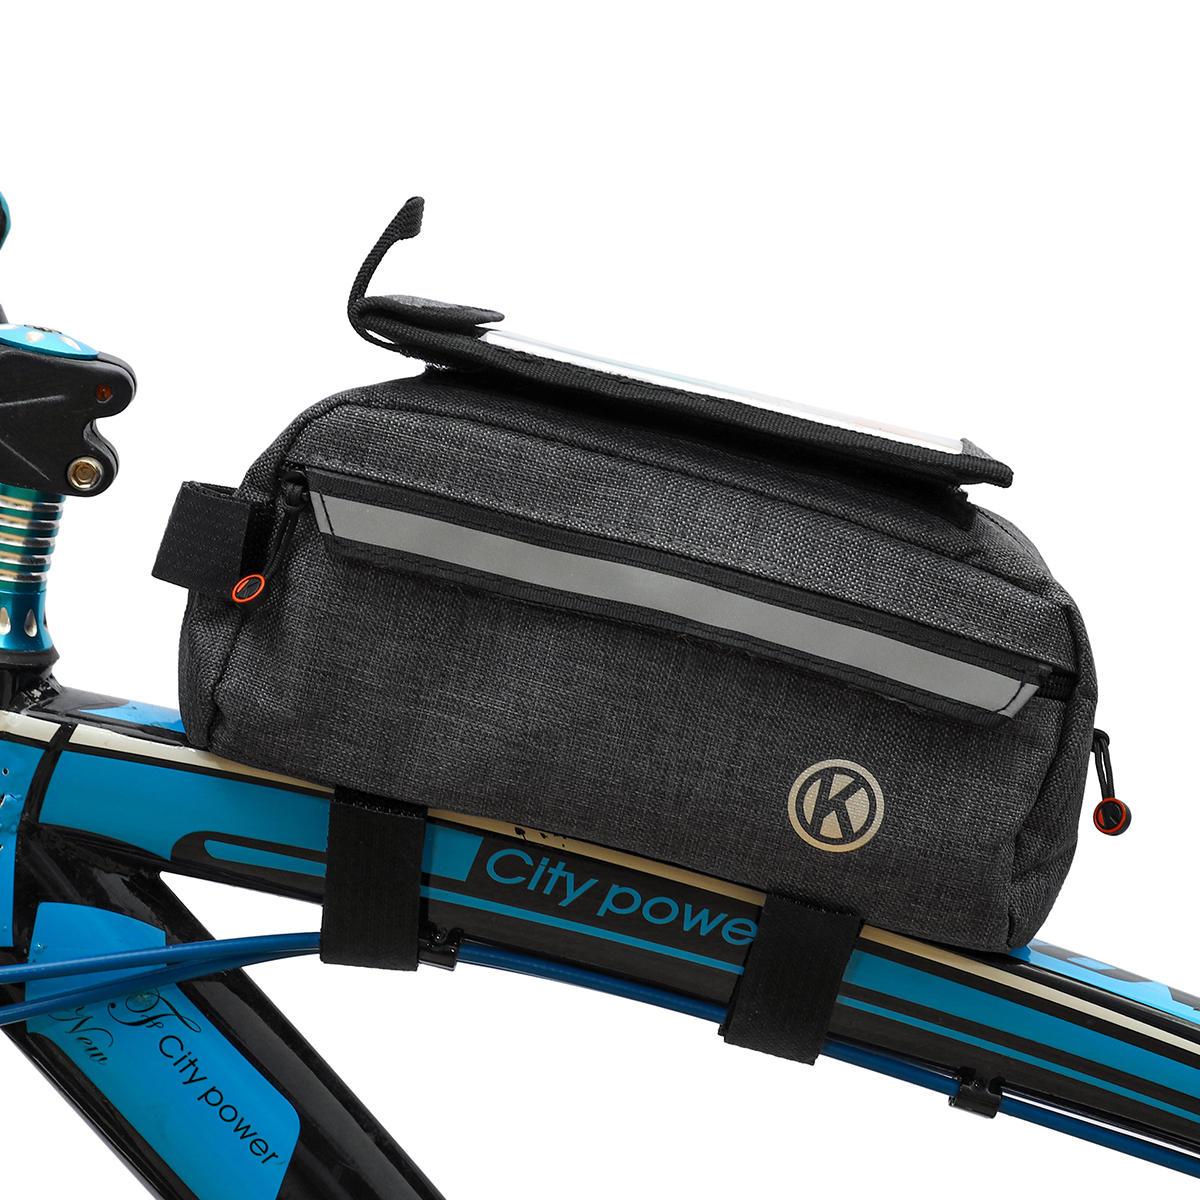 Almacenamiento de la viga delantera de la bicicleta Bolsa Teléfono móvil Bolsa Bicicleta de montaña de gran capacidad Bo